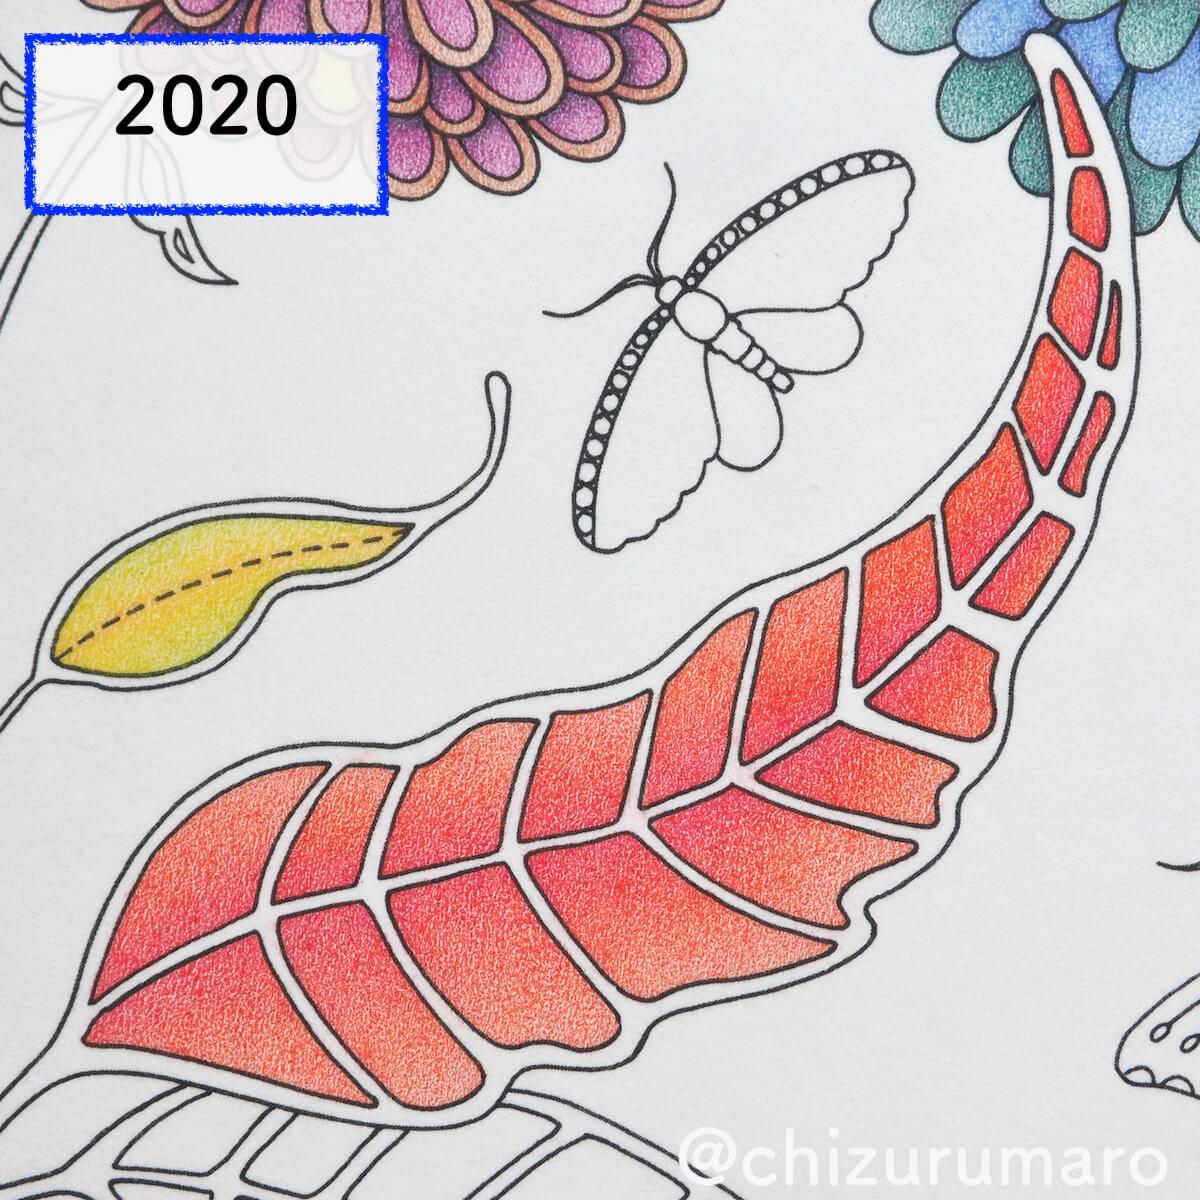 f:id:chizurumaro:20200603122407j:plain